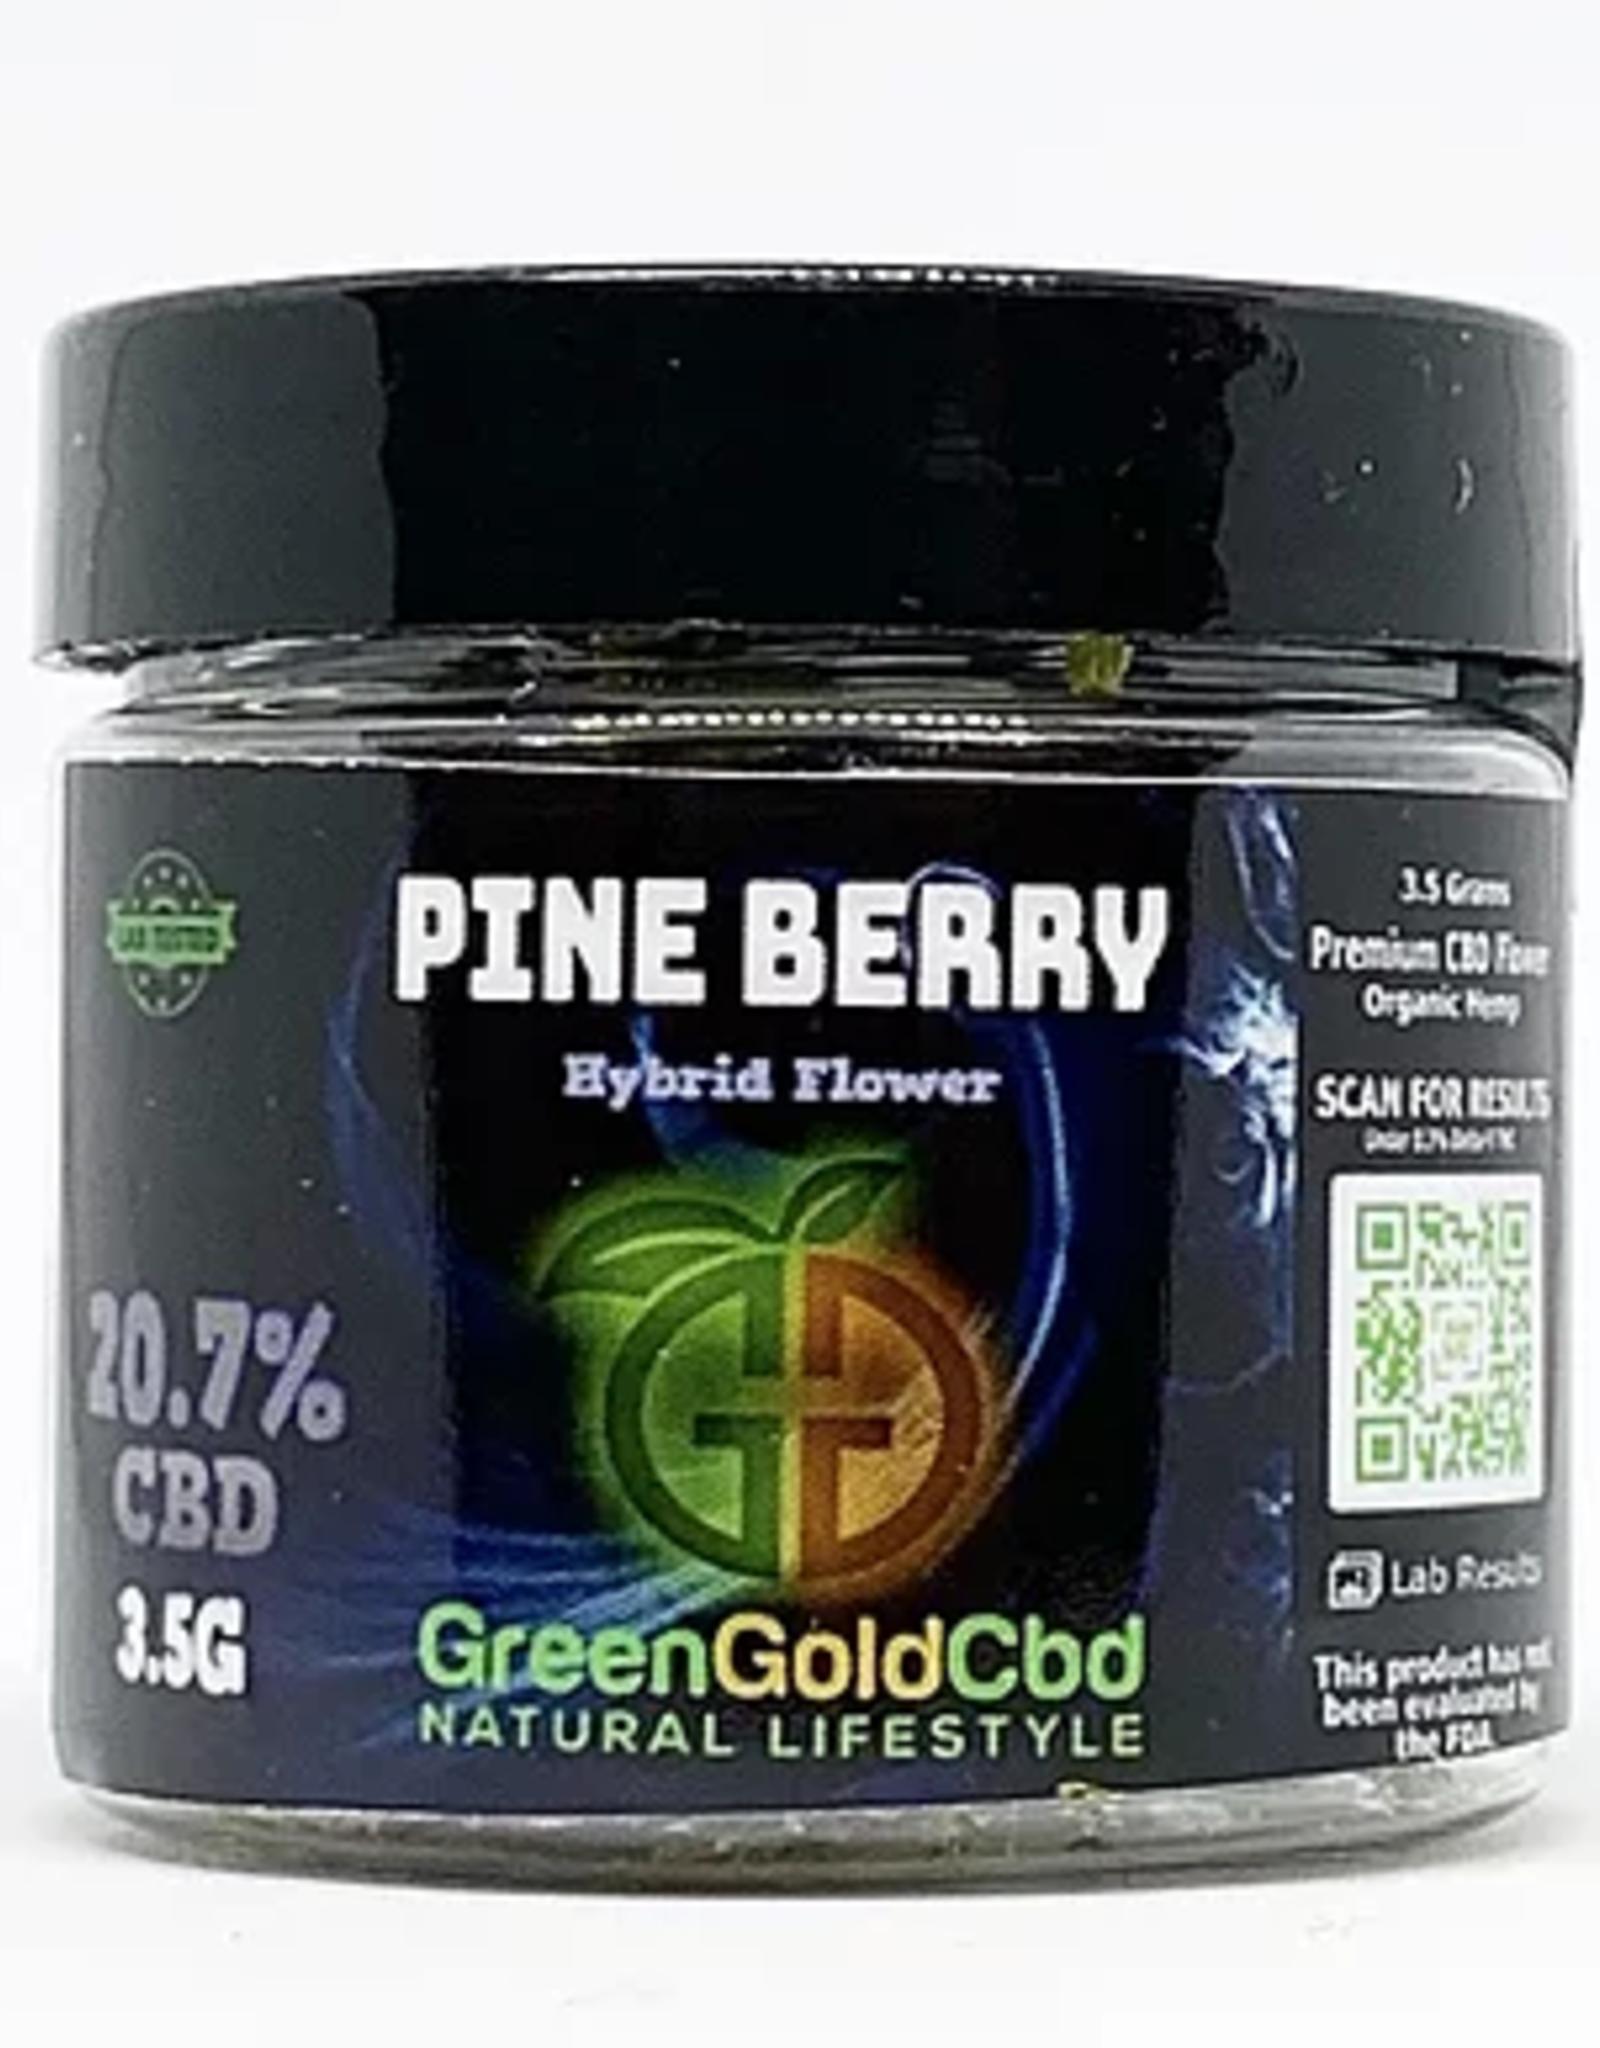 Green Gold CBD CBD Flower Pineberry, 3.5g 20.7% CBD